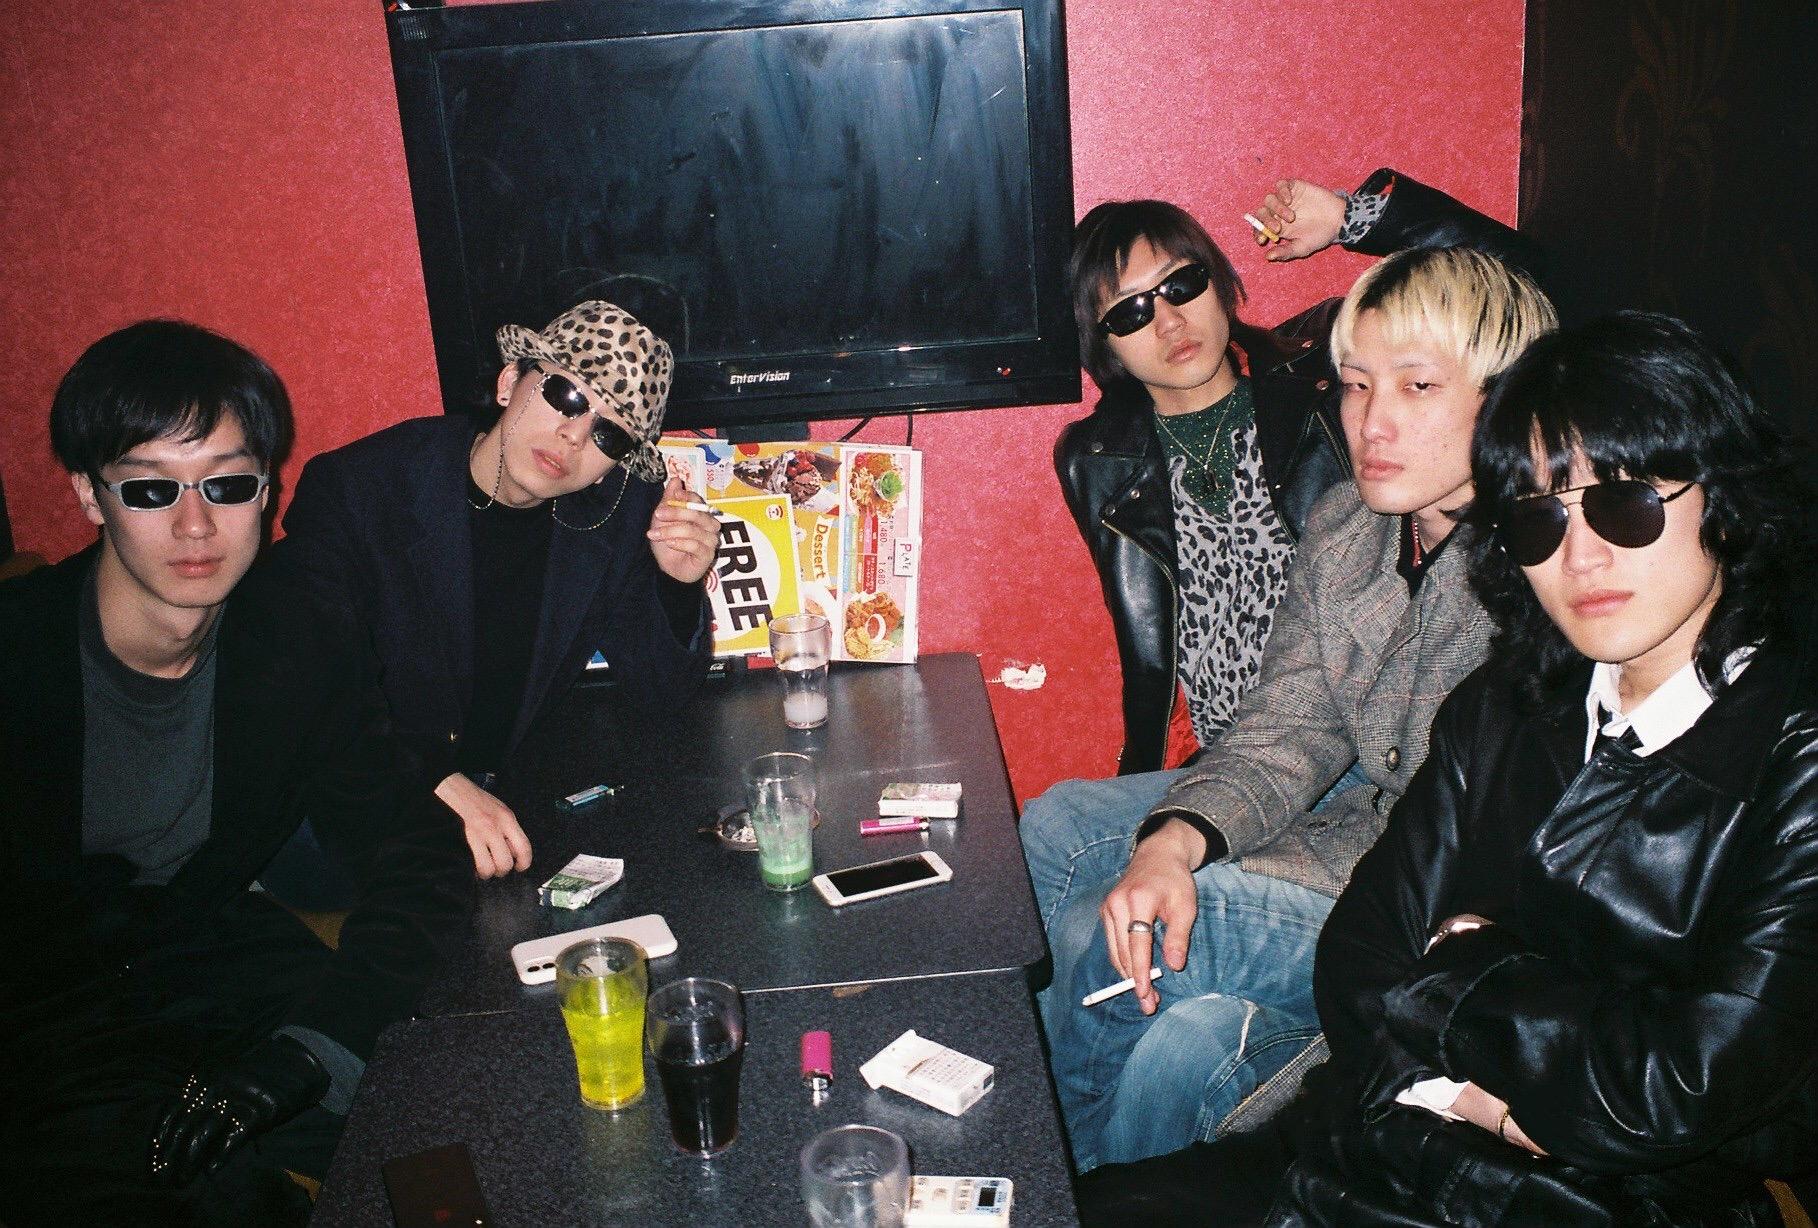 Waater rock band punk experimental three shimokitazawa karaoke spotify escapes